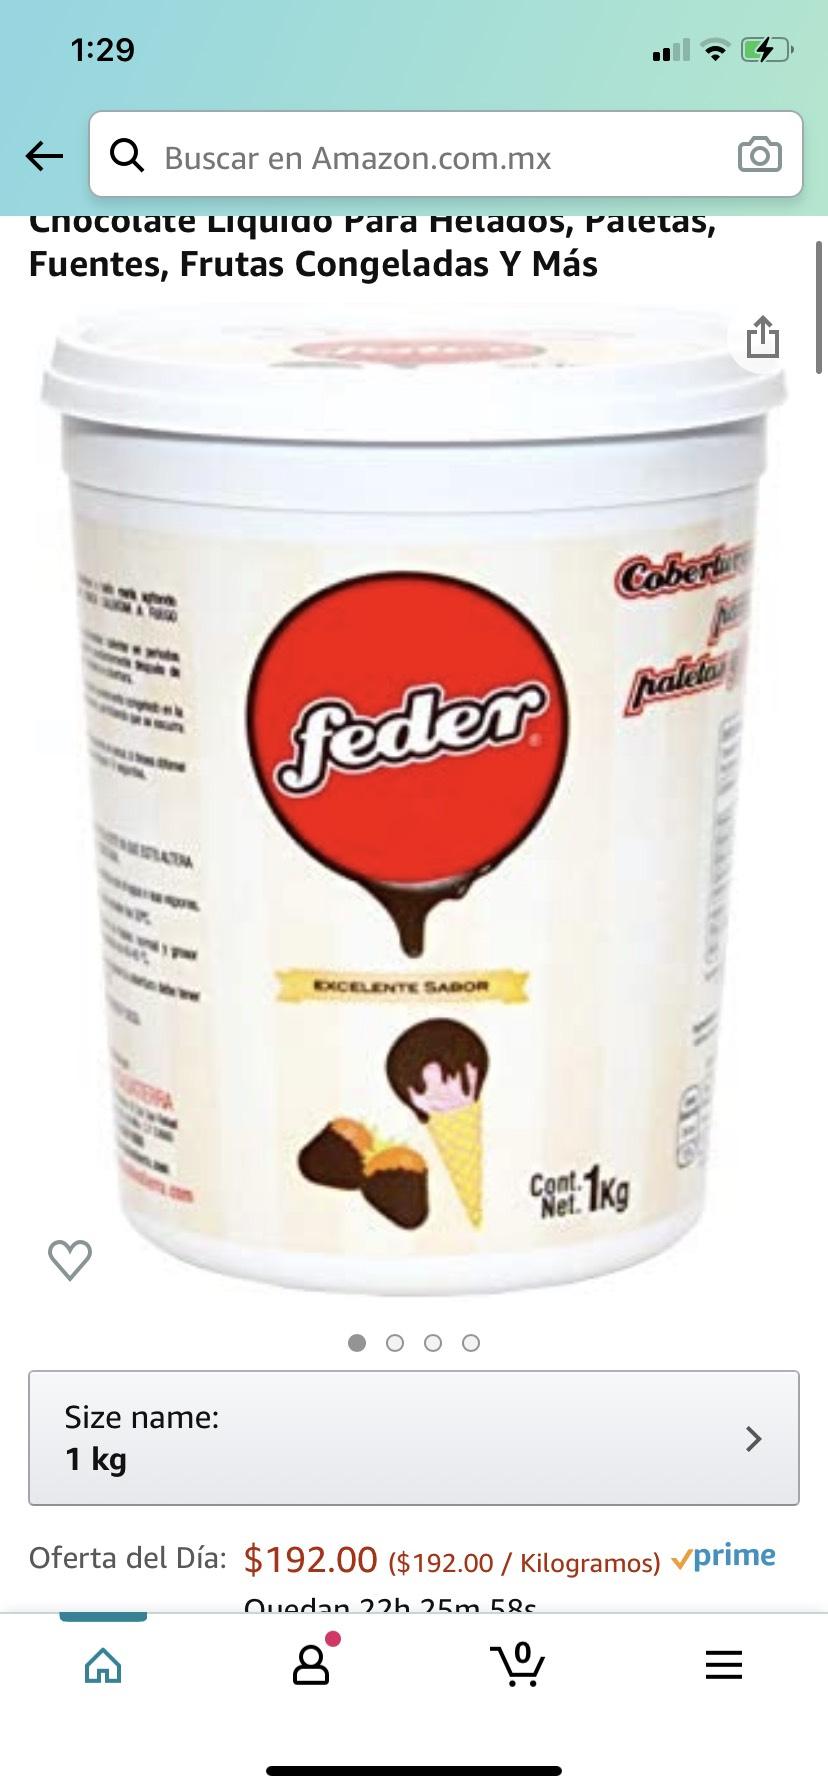 Amazon: Feder - Cobertura De Chocolate 1 Kg